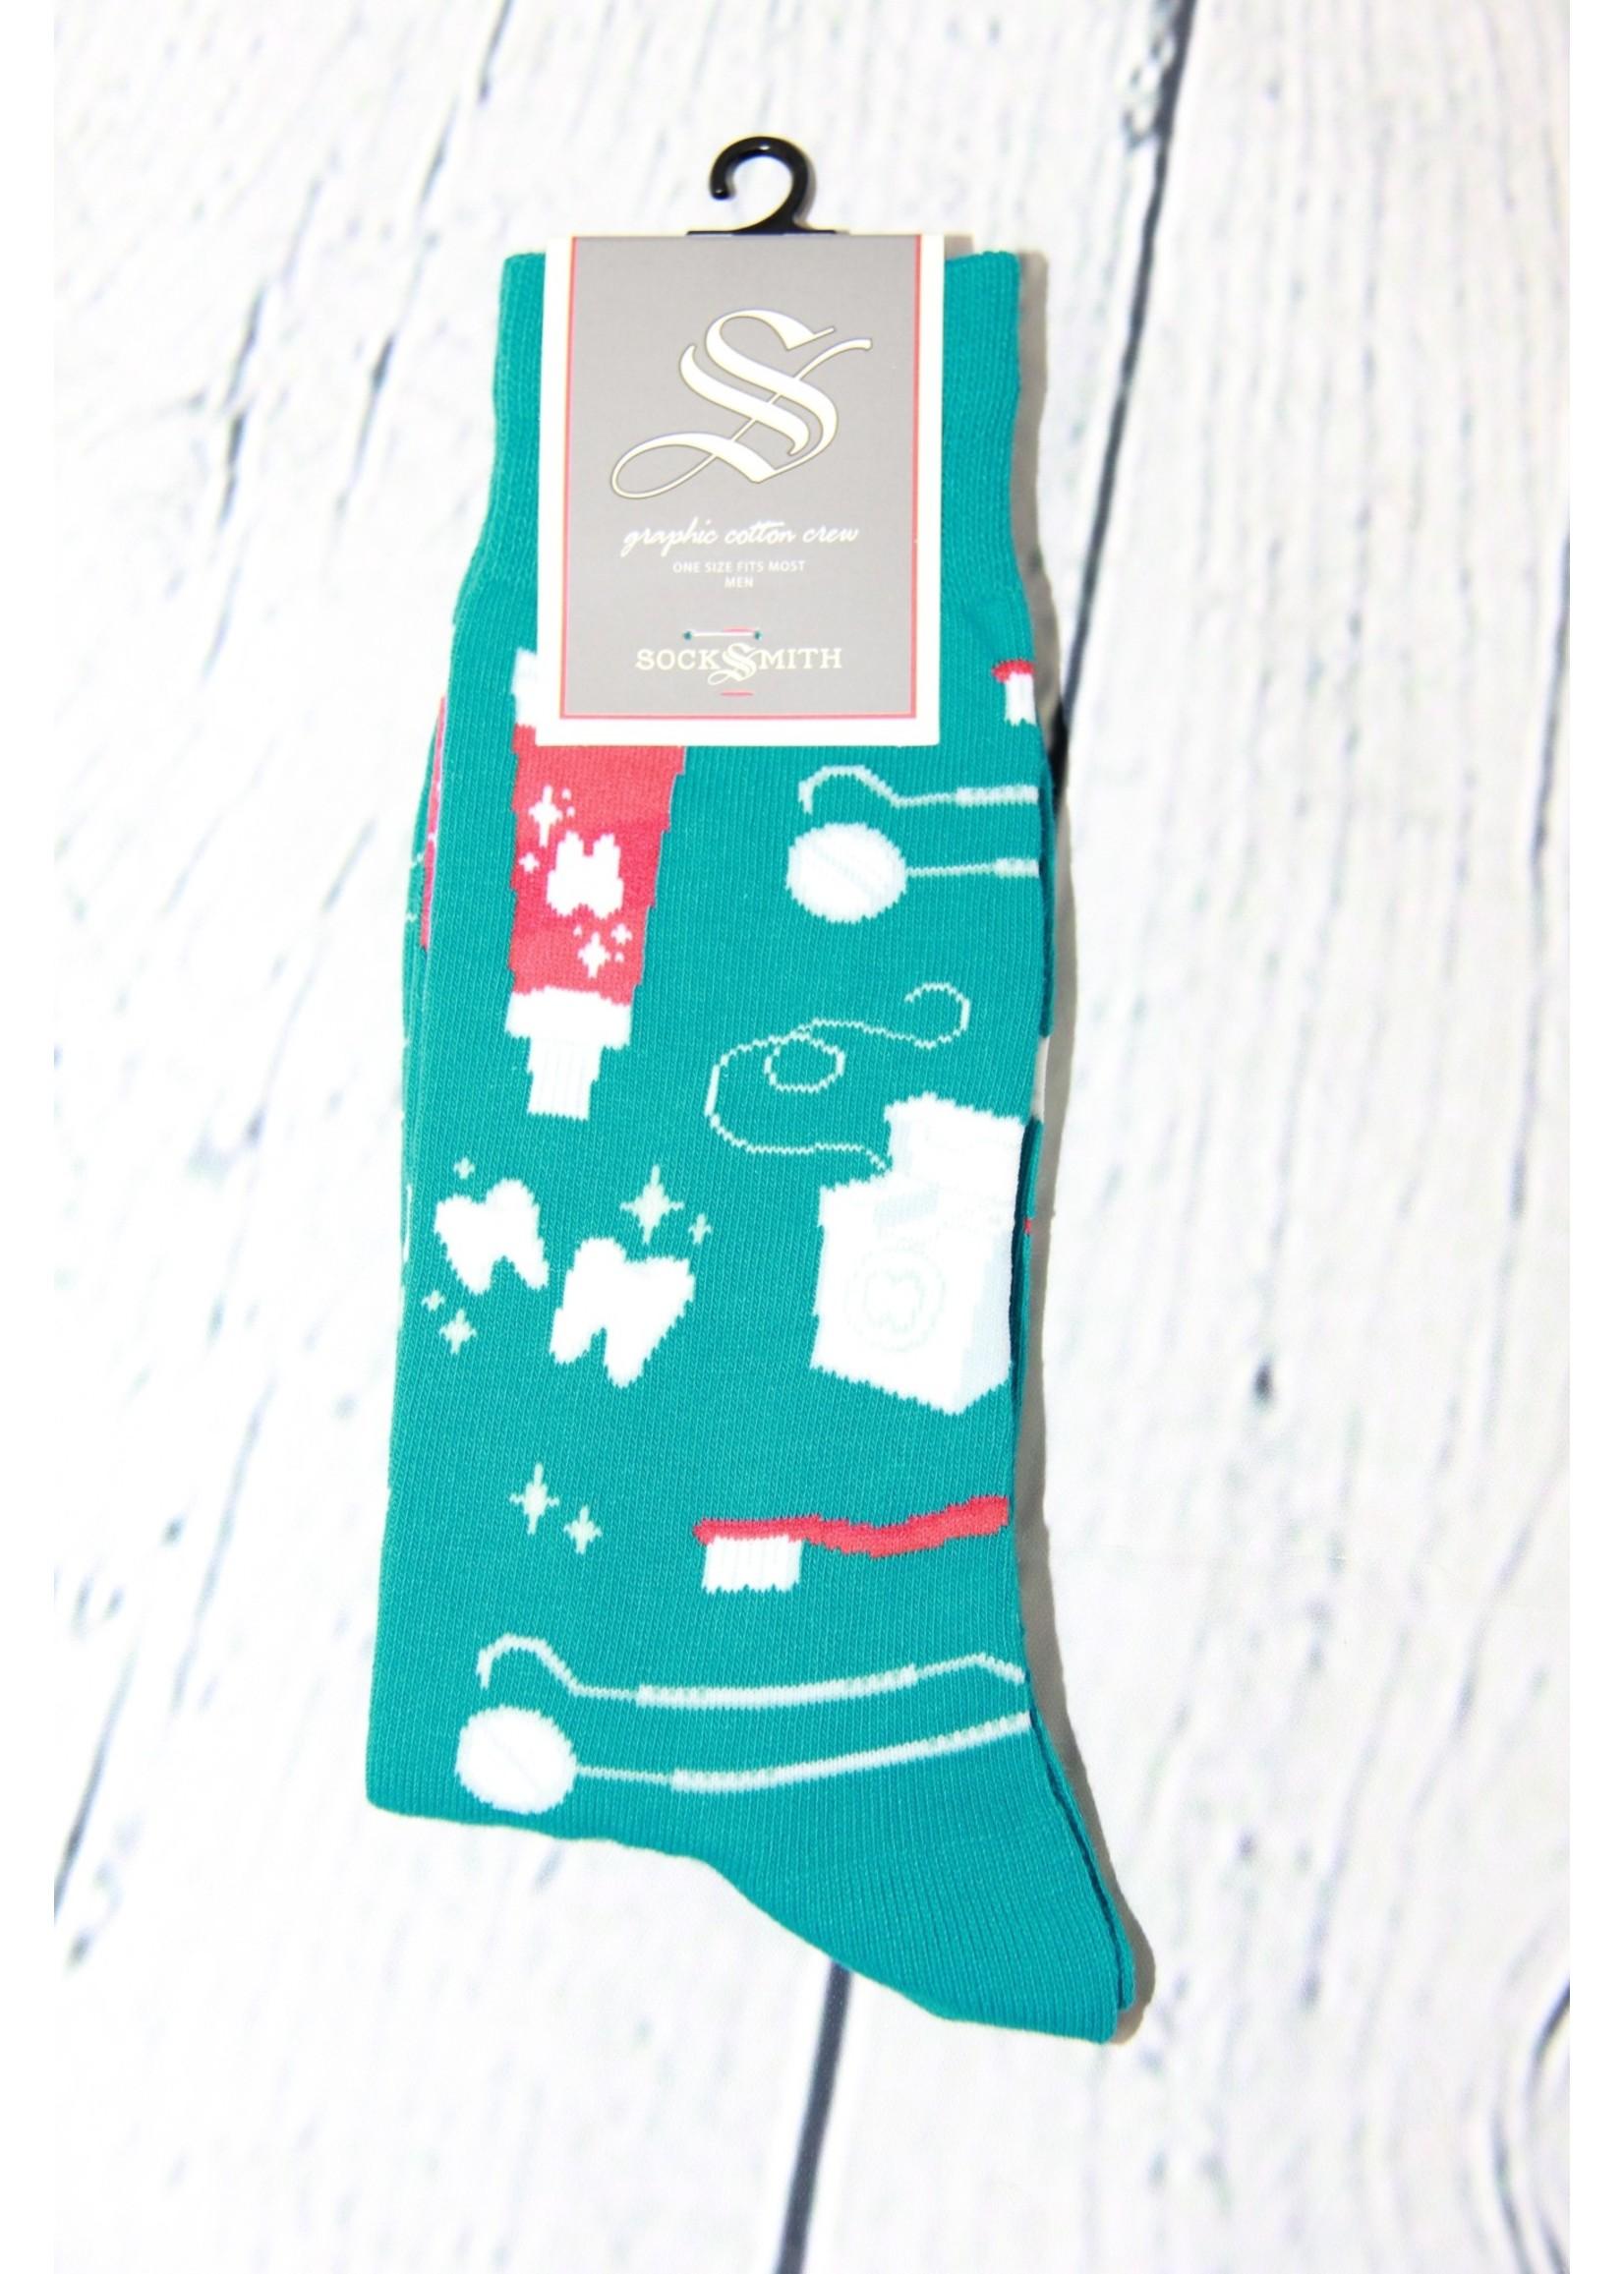 SockSmith Pearly Whites Sock